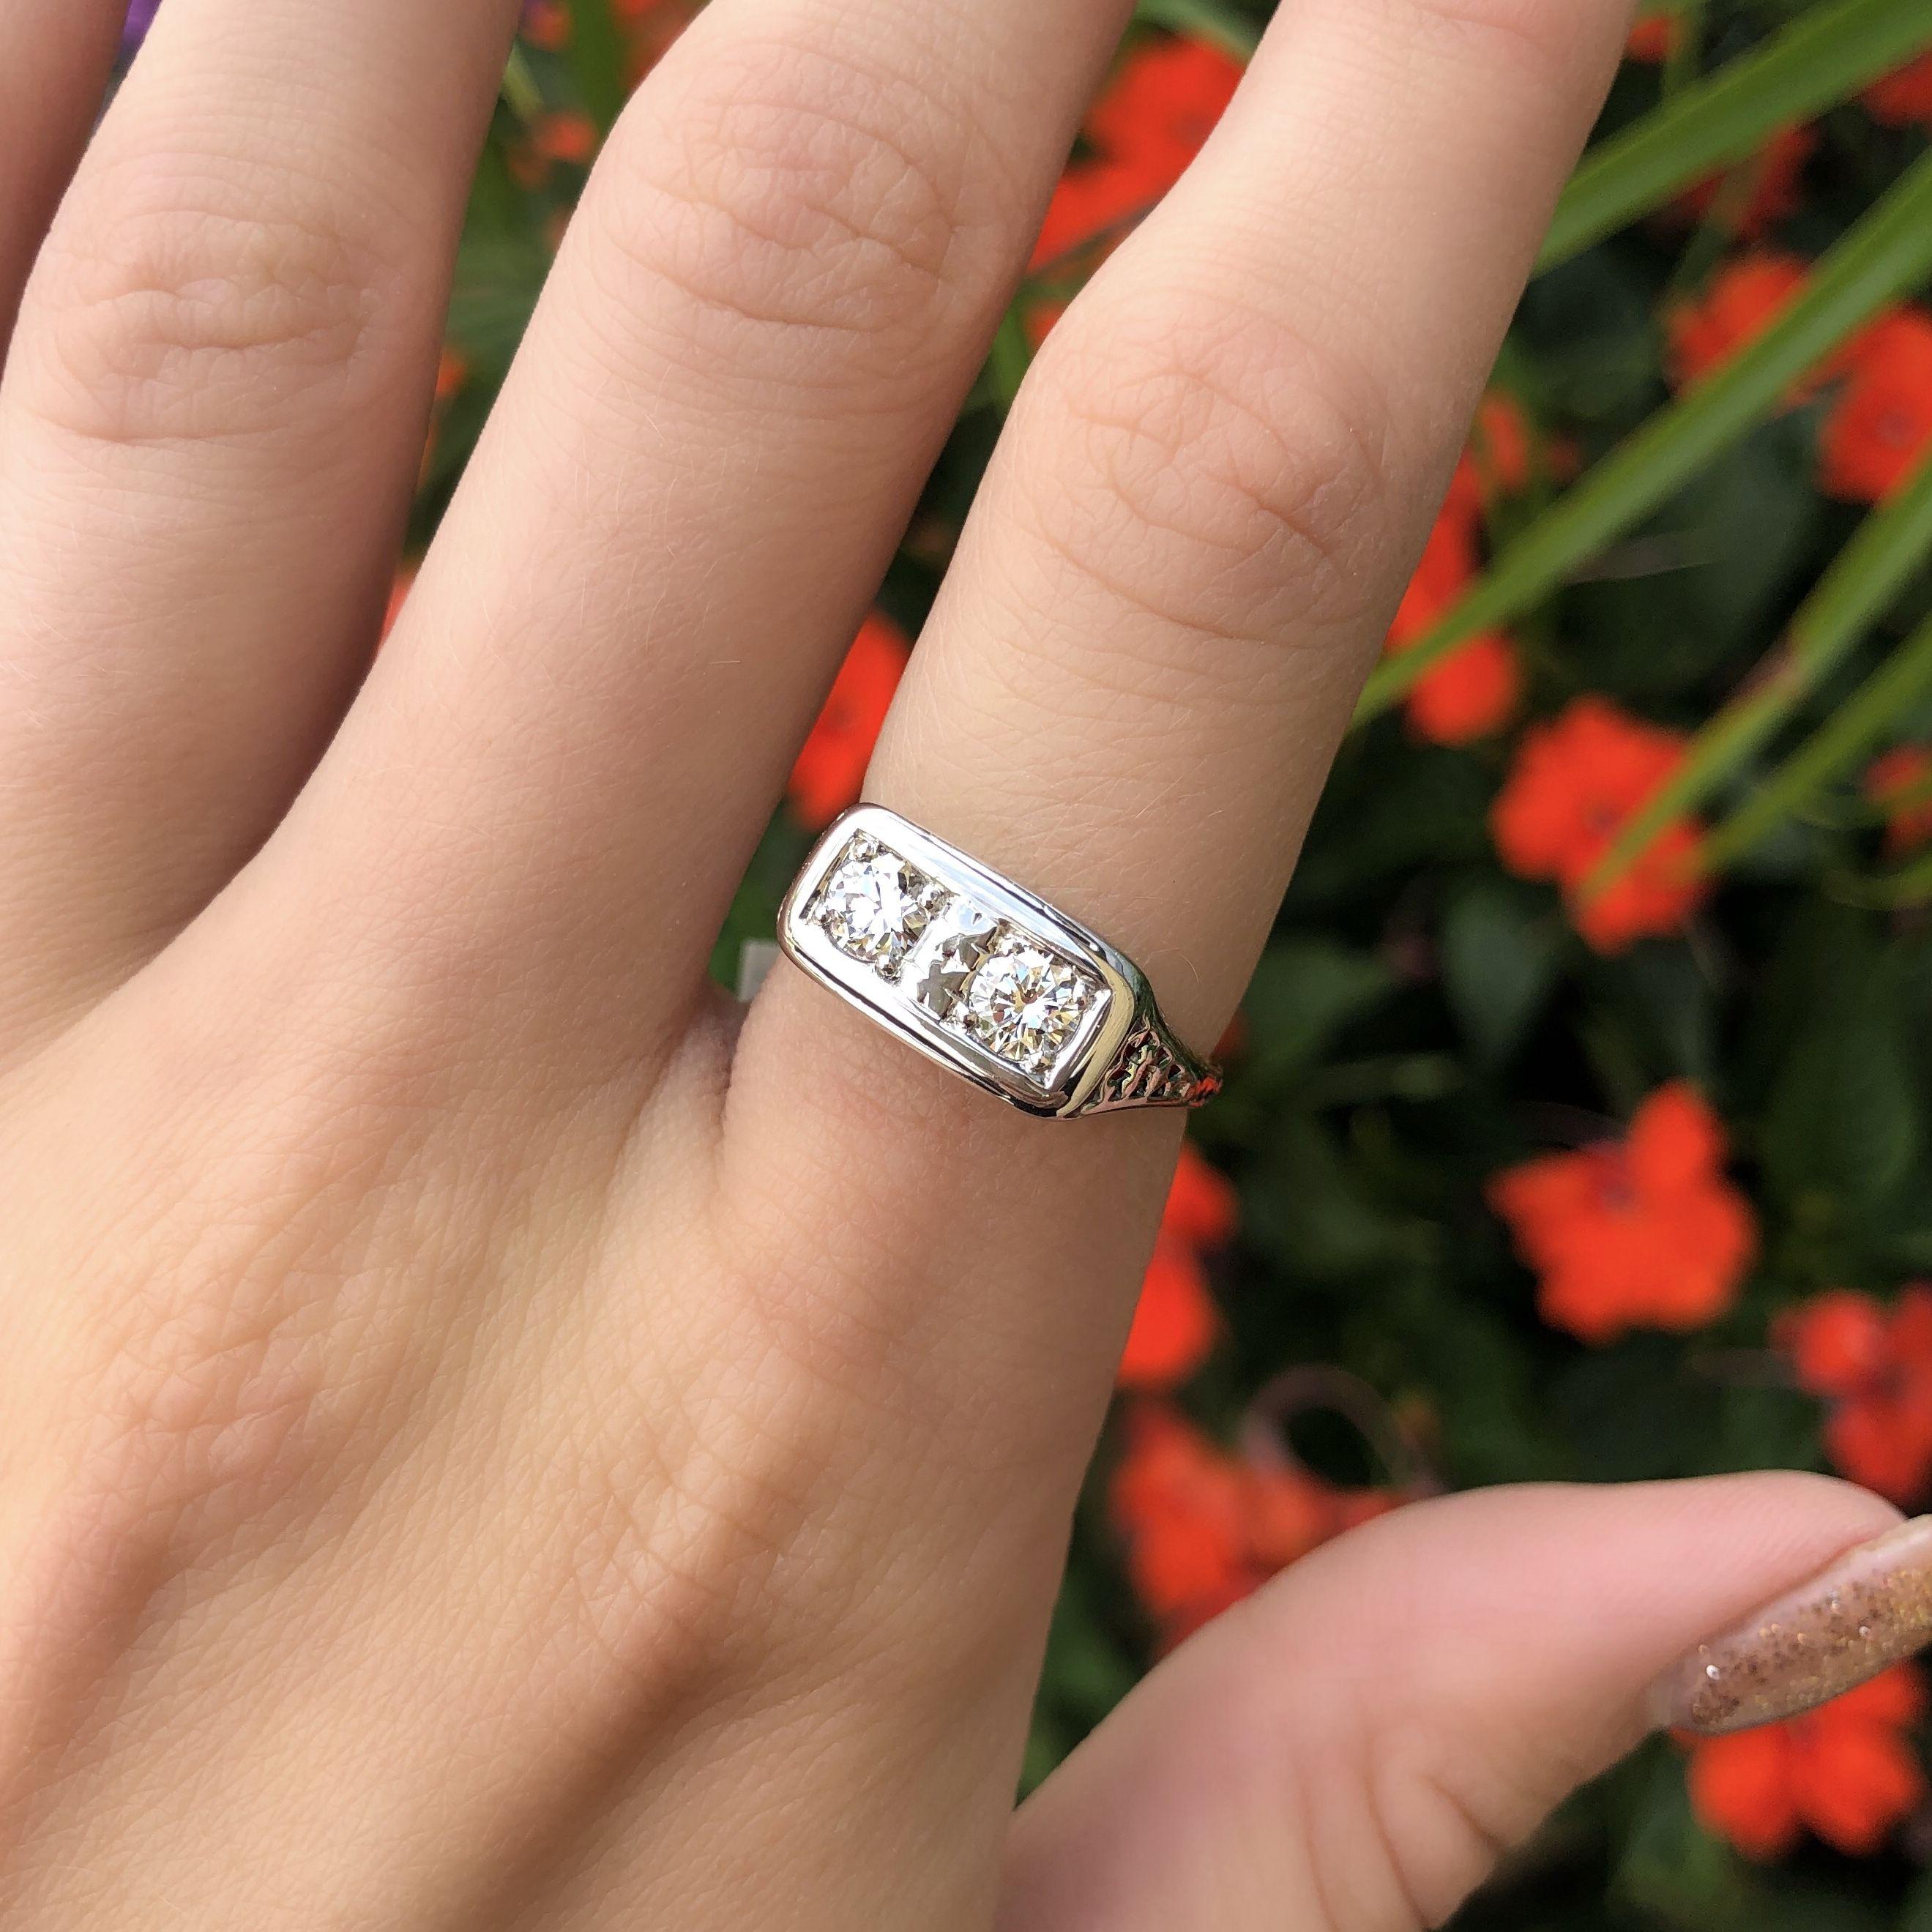 Engagement Rings Kansas City: 2 Stone Diamond Ring. Annual Summer Sizzling Sale 2018